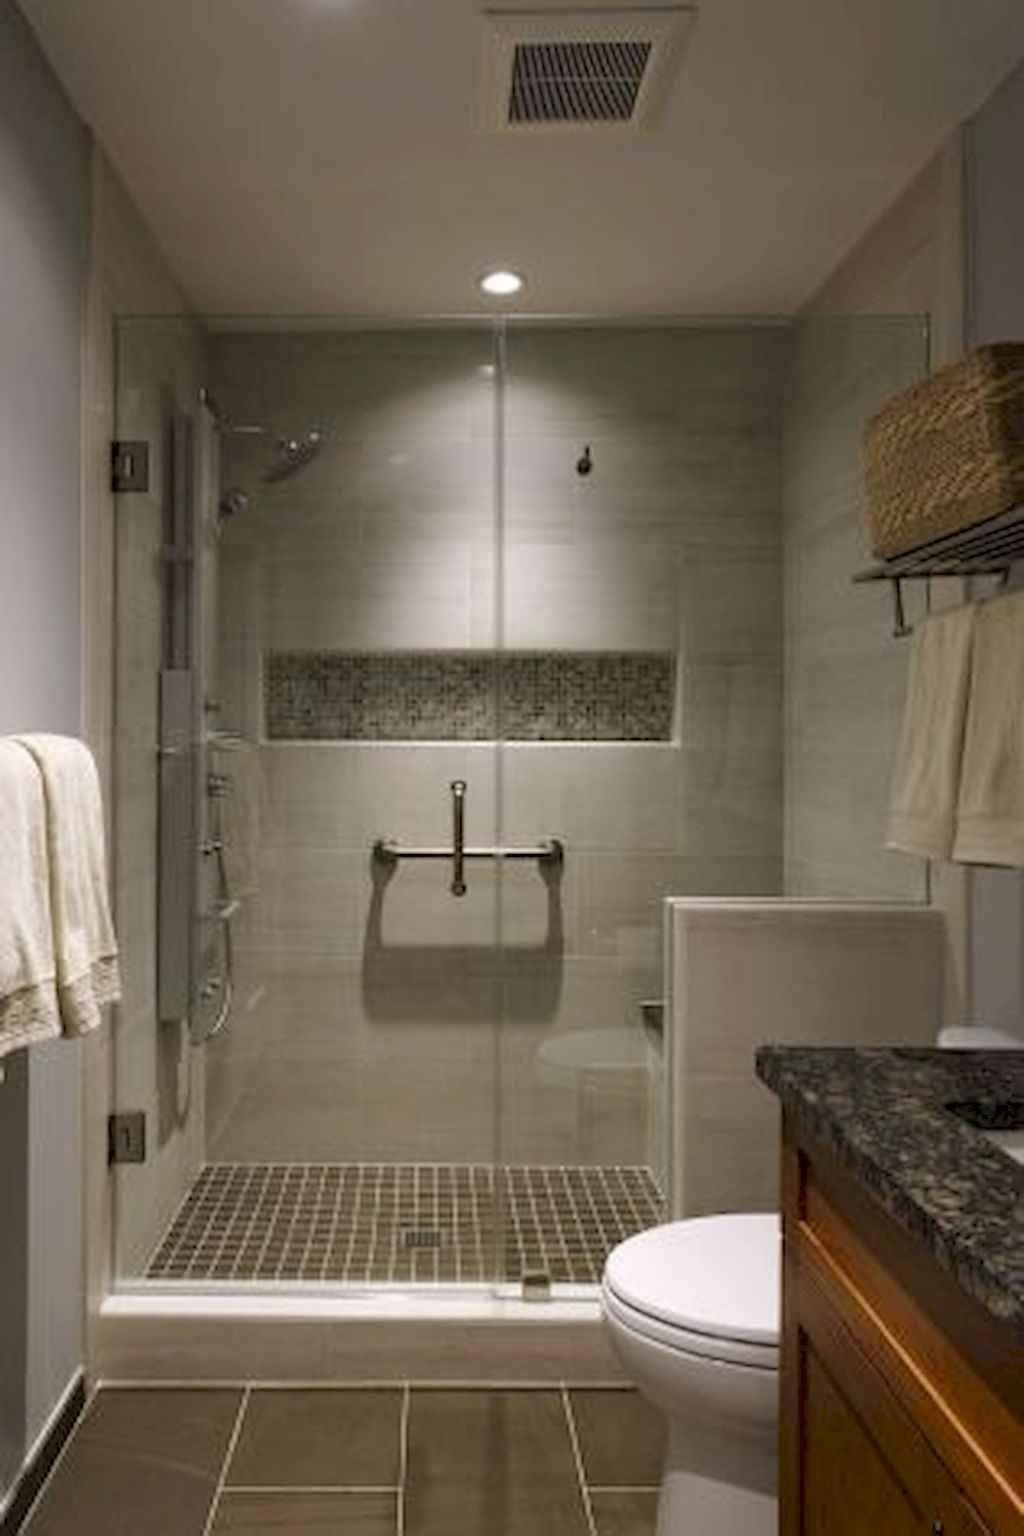 150 Stunning Farmhouse Bathroom Tile Floor Decor Ideas And Remodel To Inspire Your Bathroom 16 Ba In 2020 Small Bathroom Tiles Tub To Shower Remodel Bathroom Design